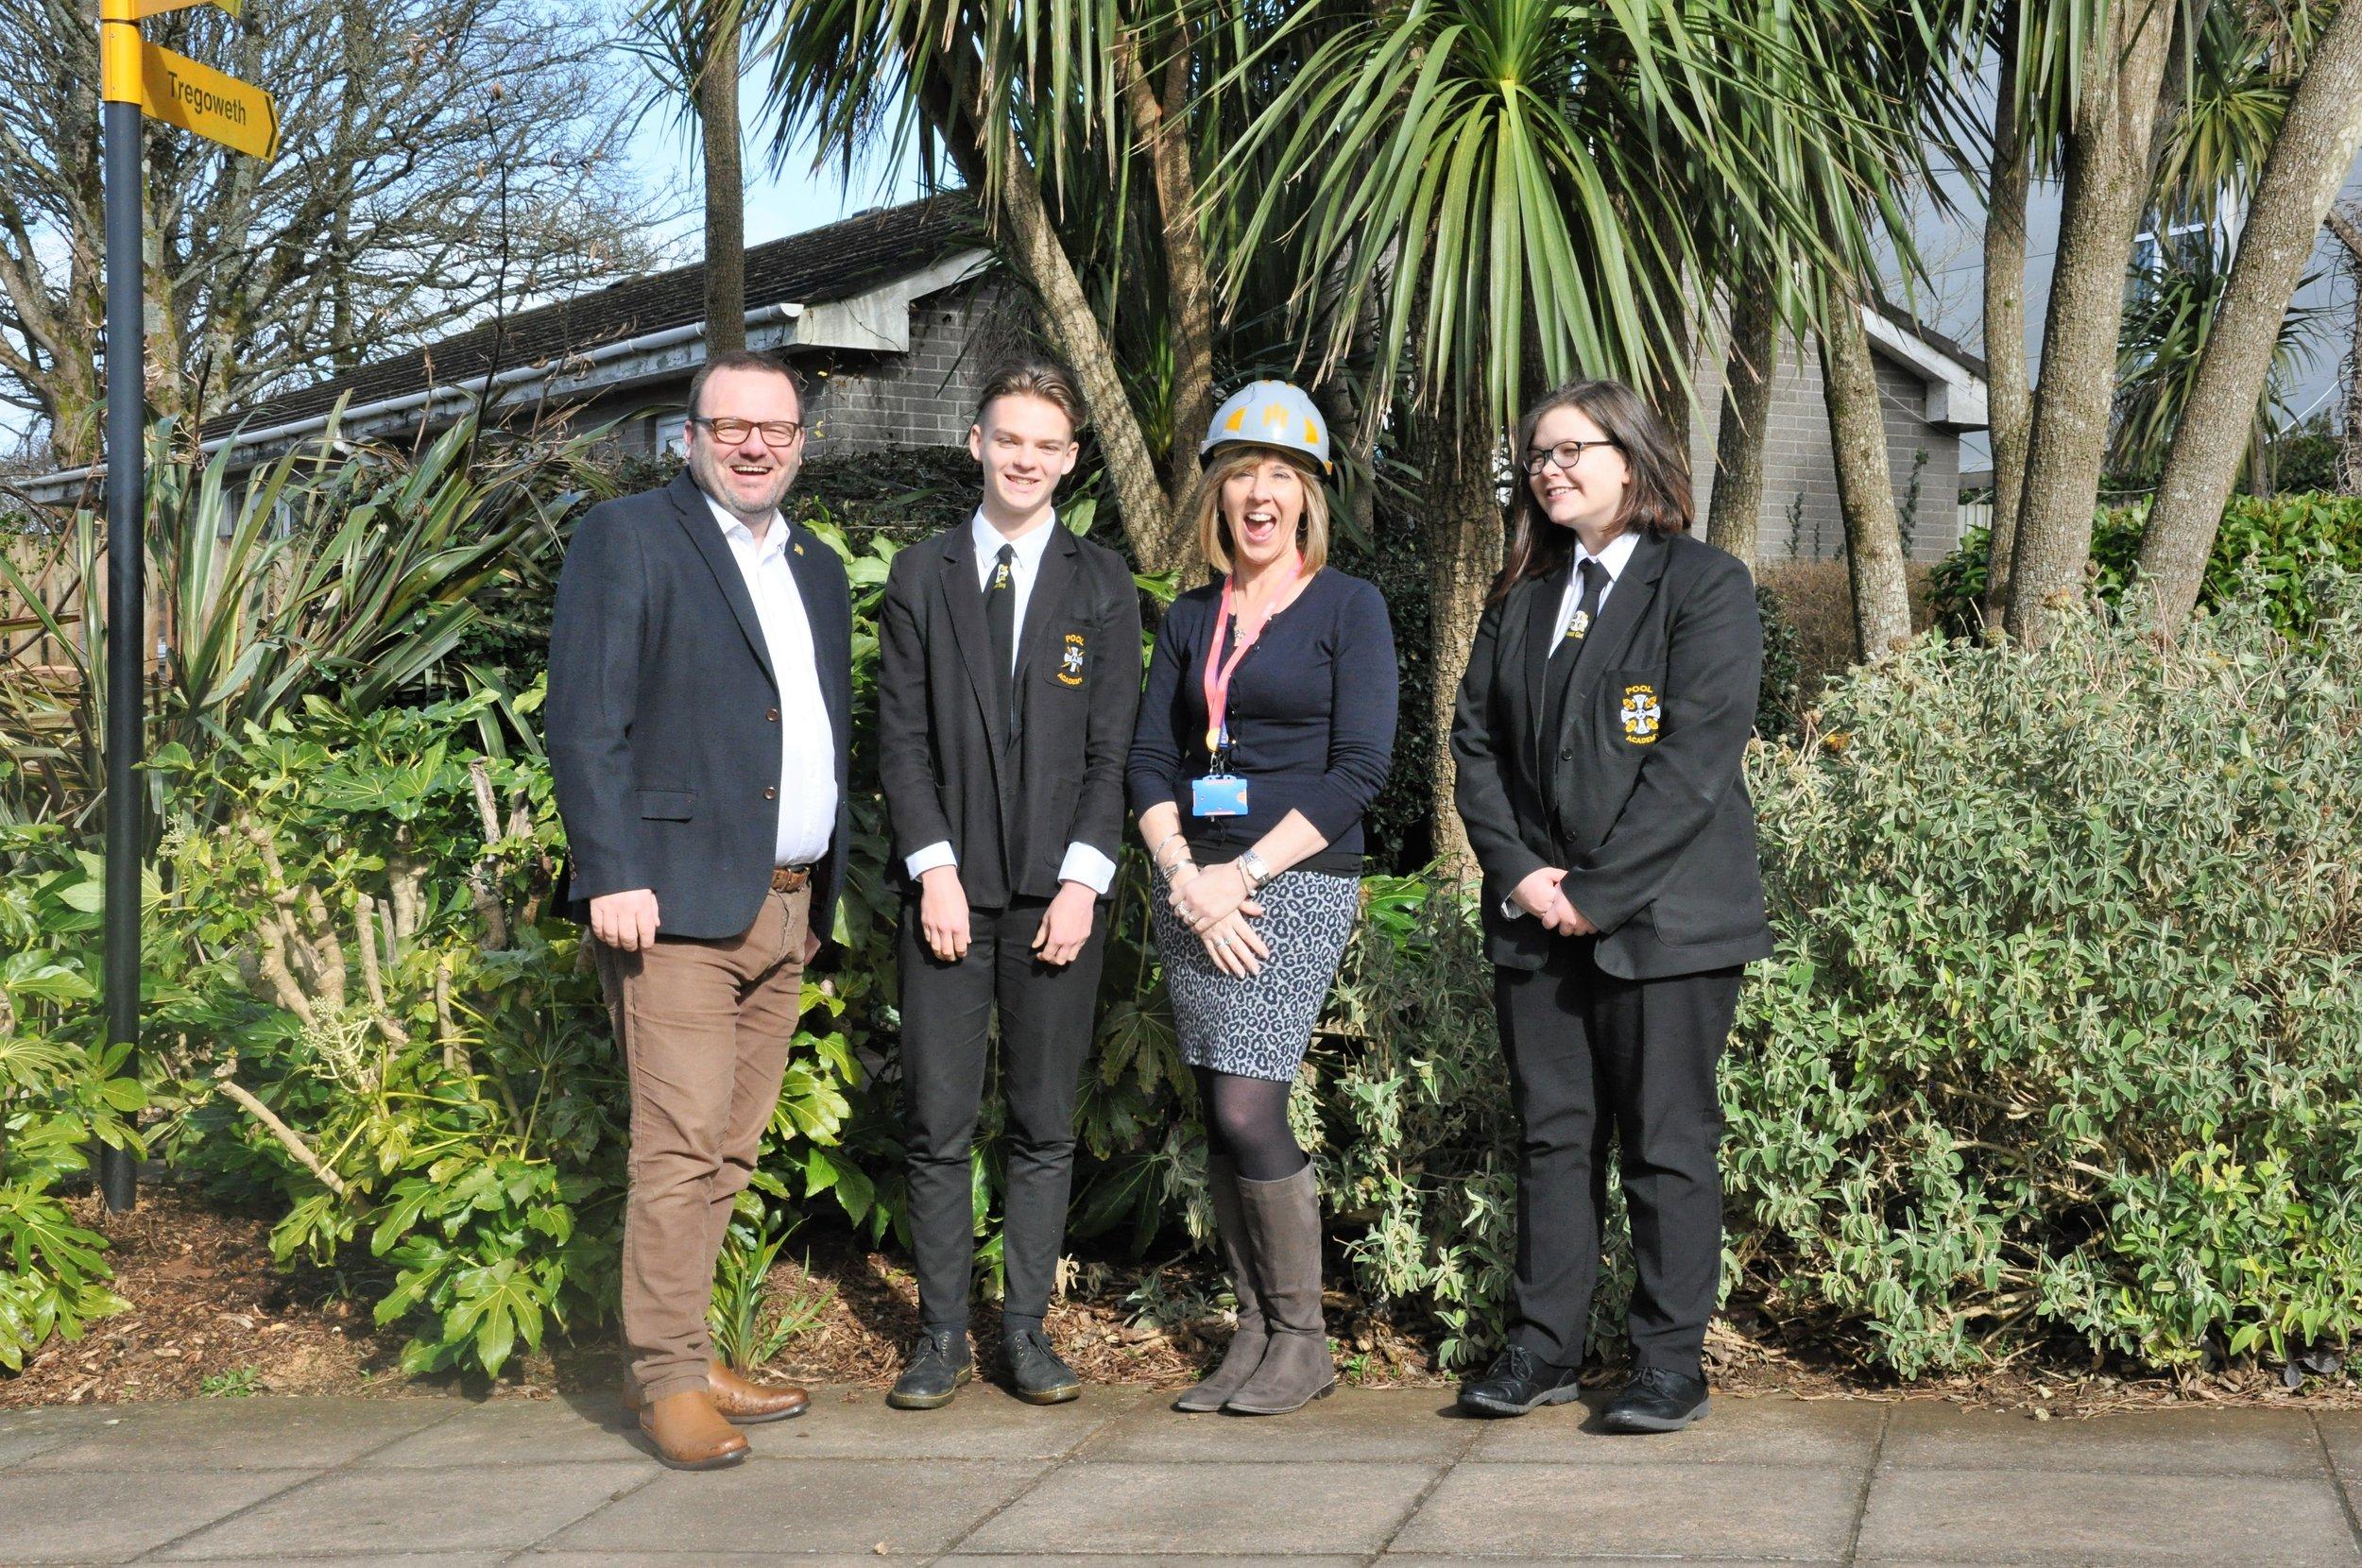 MIDAS Group representative with Head Girl, Head Boy and Nicola Grenfell the school career Advisor